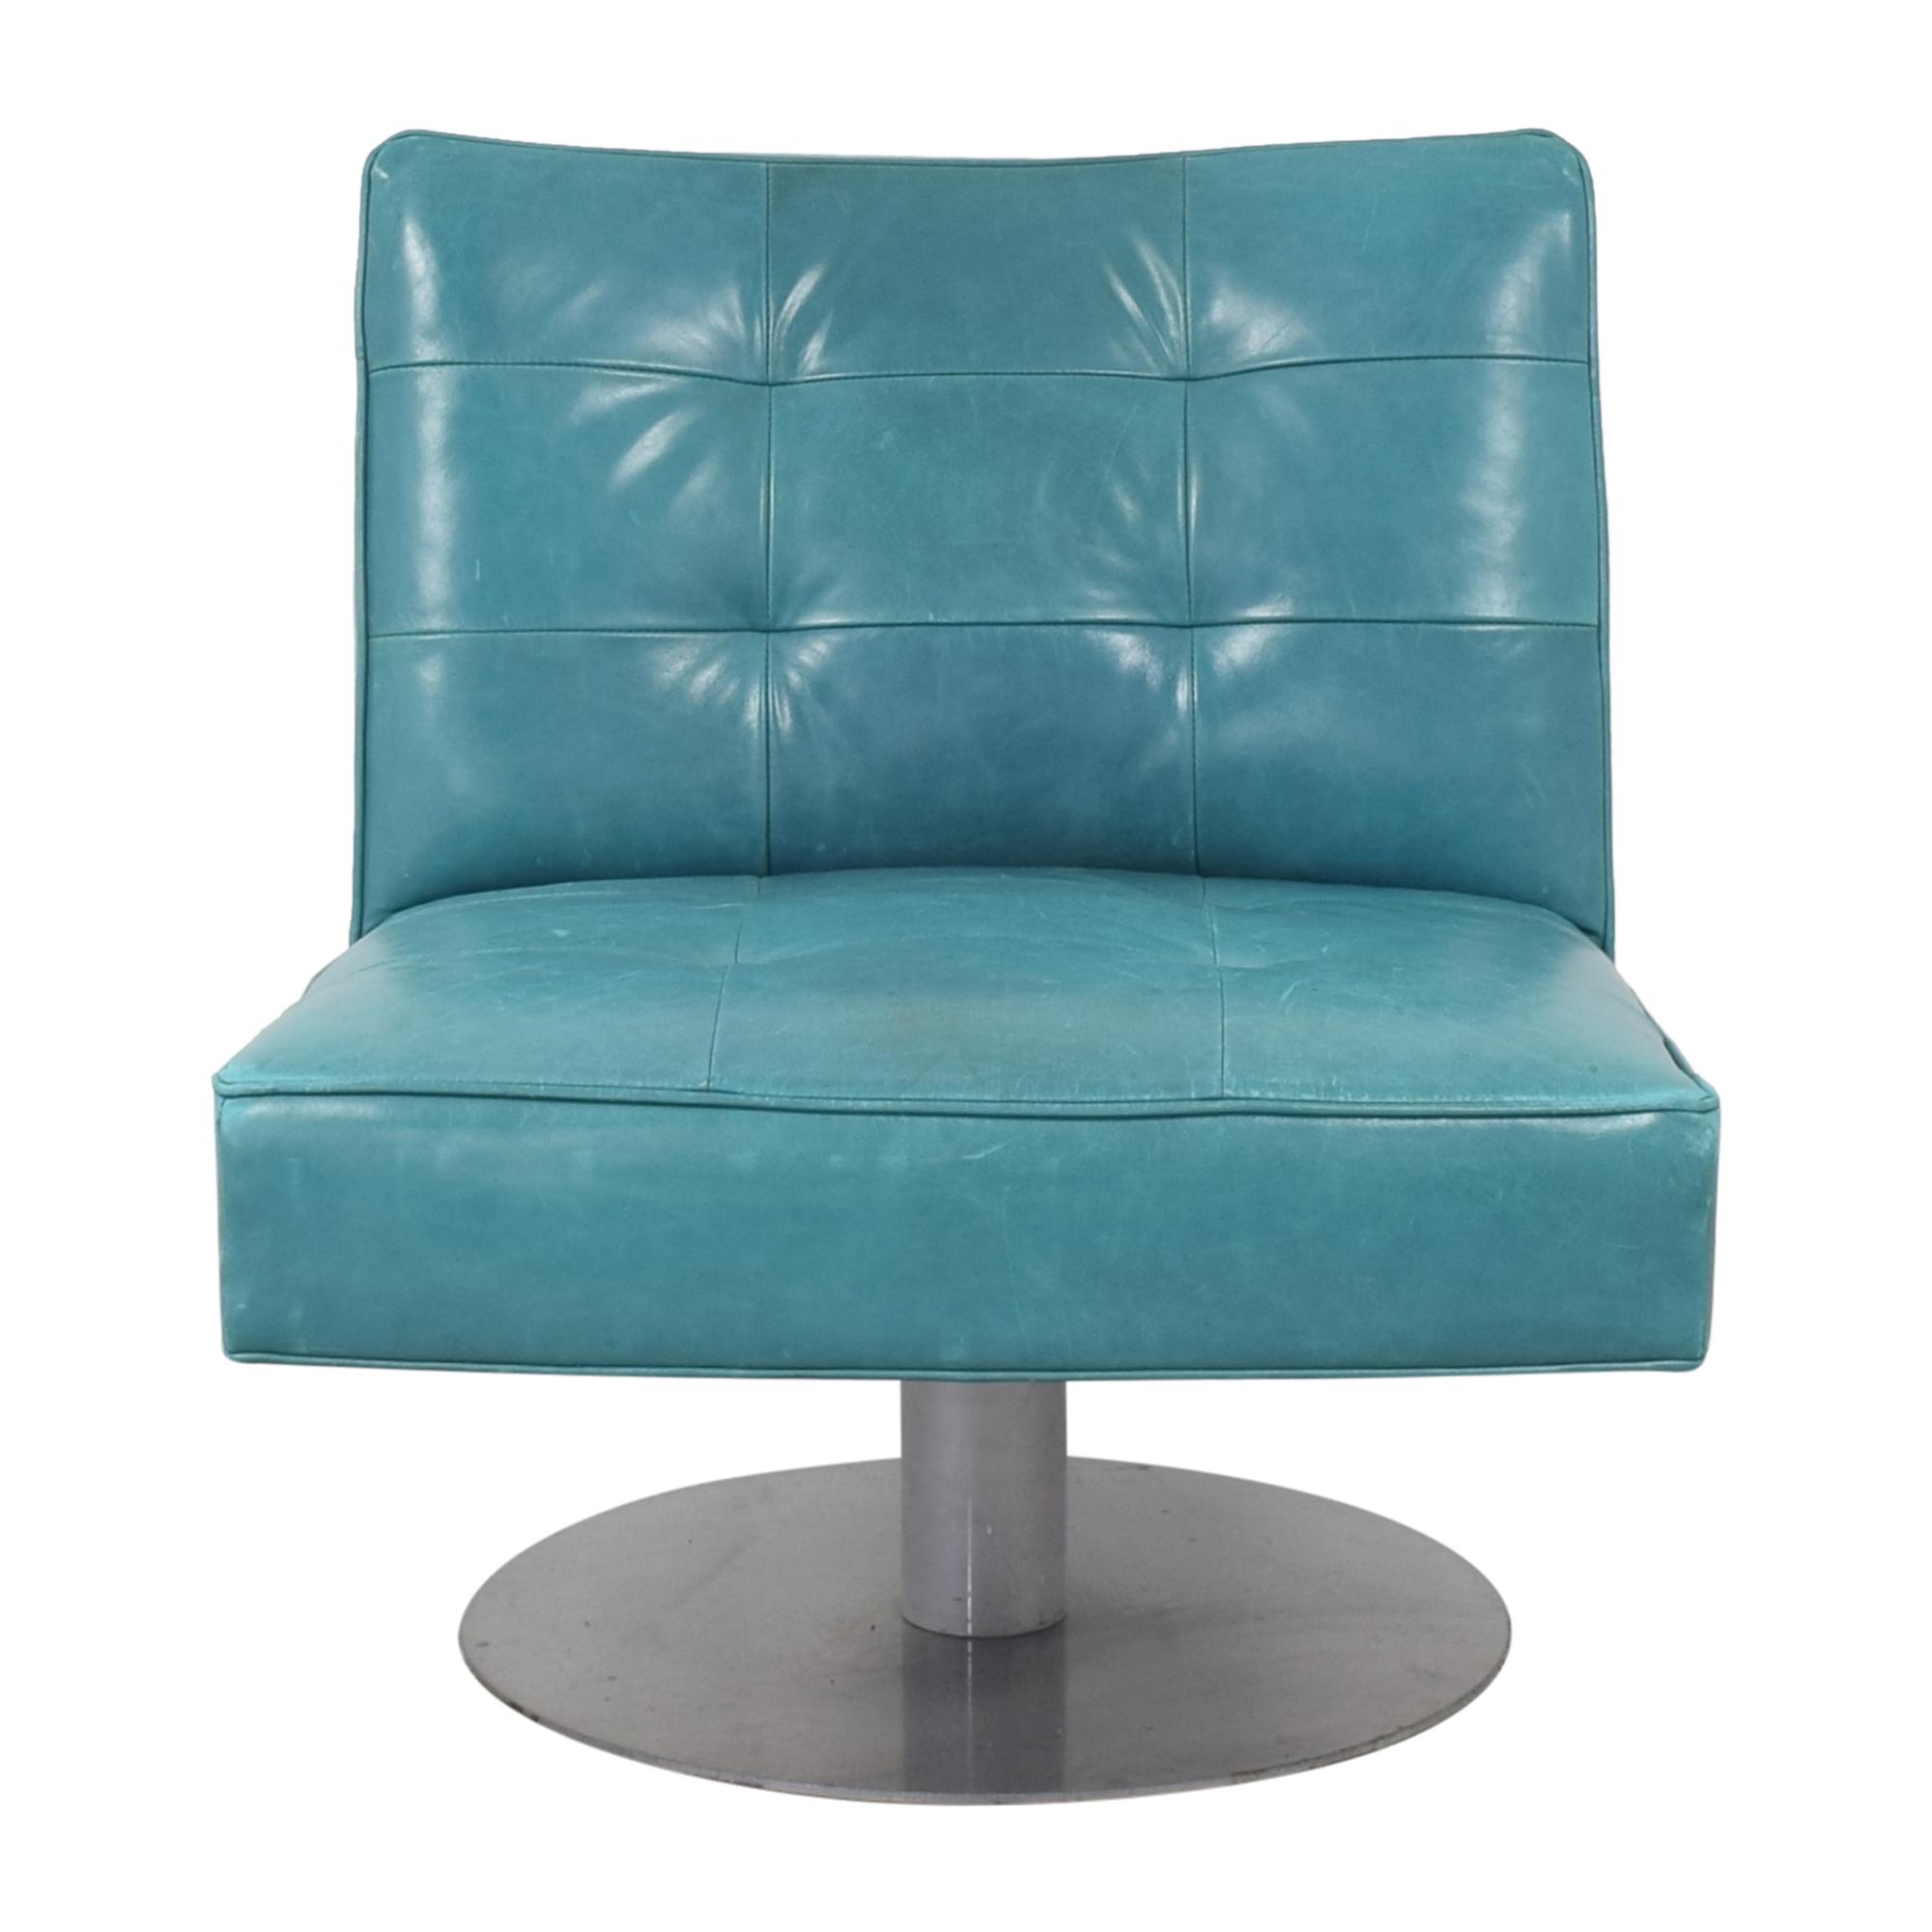 Mitchell Gold + Bob Williams Swivel Chair / Chairs